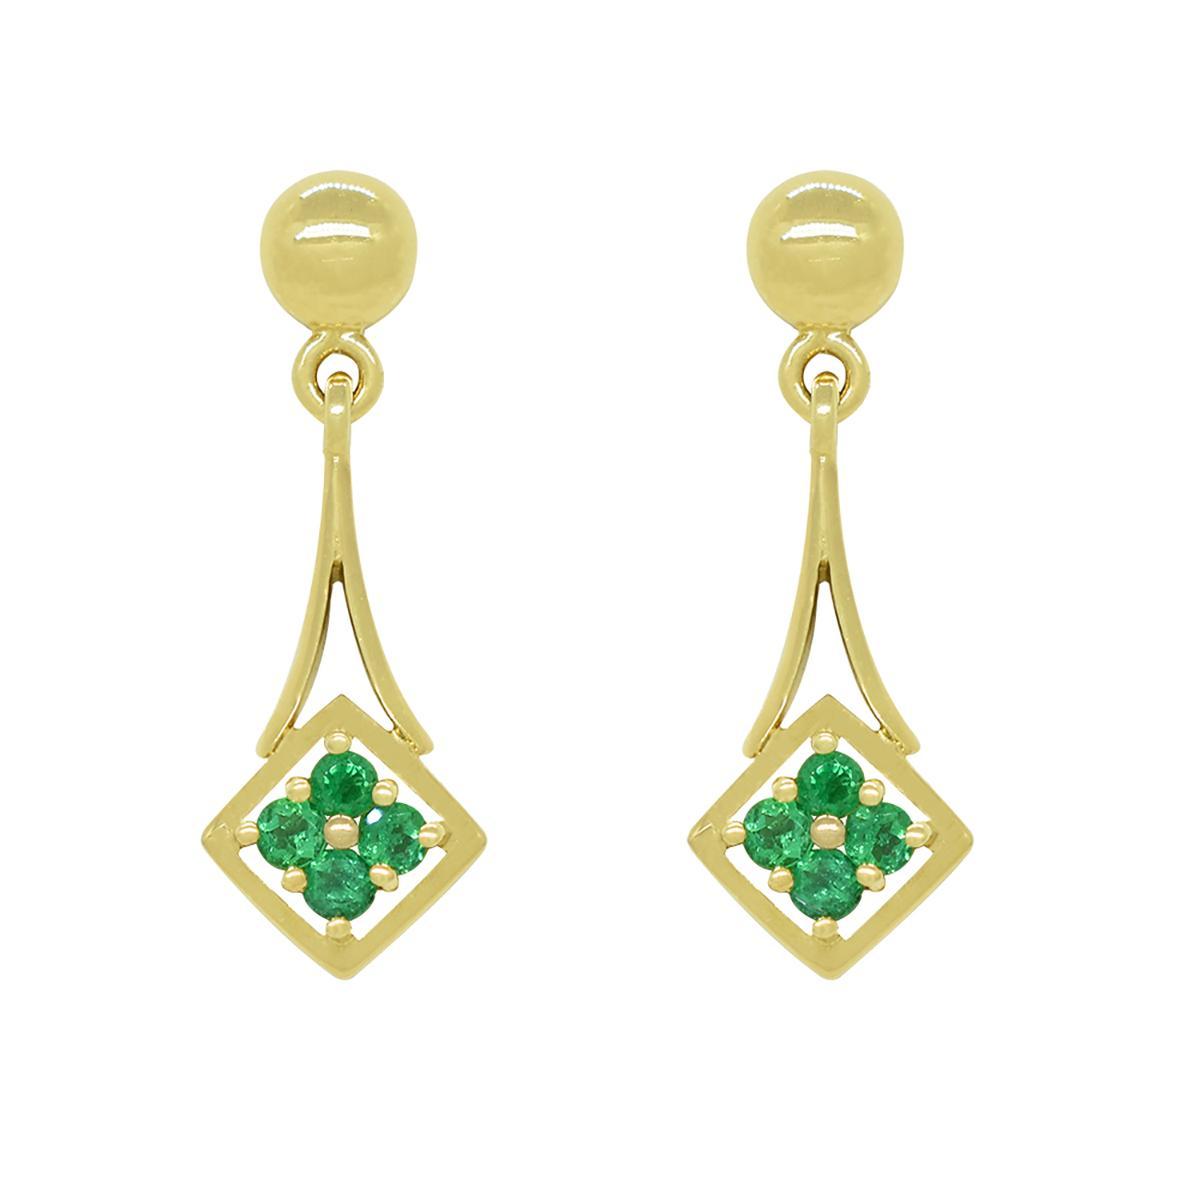 small-chandelier-earrings-with-round-emeralds-in-18k-yellow-gold-dainty-earrings